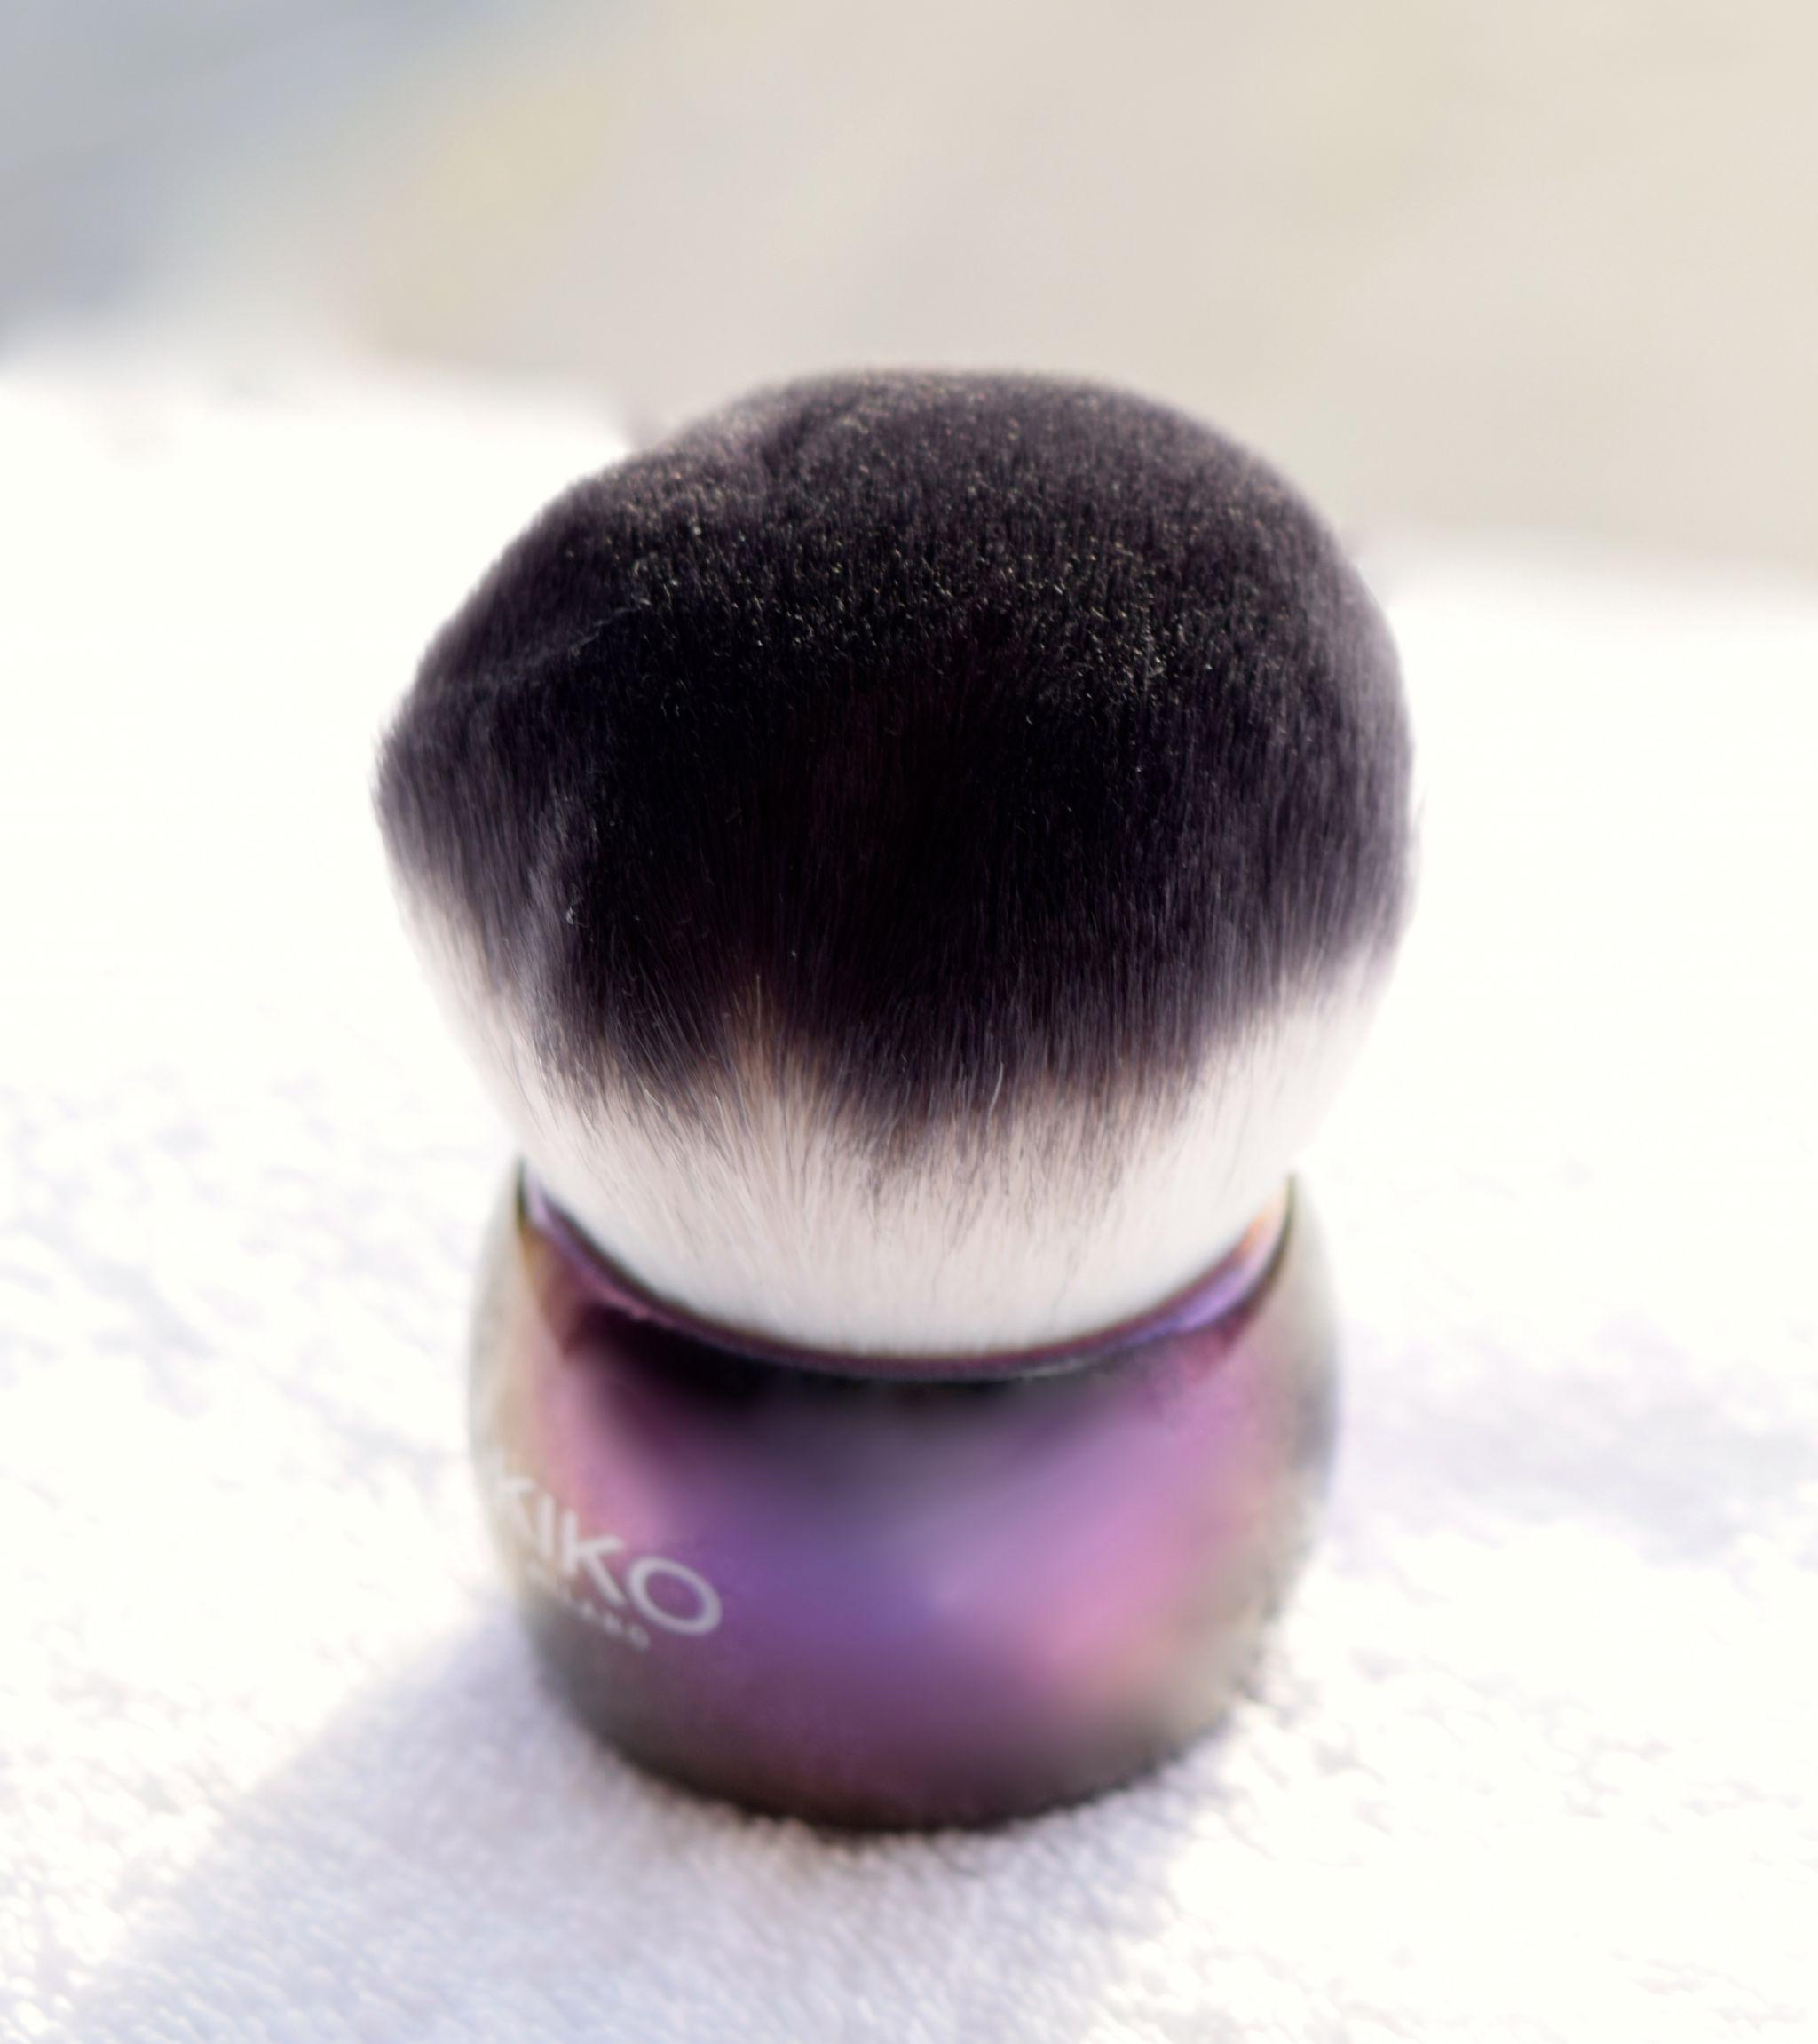 Kiko Cosmetics Midnight Siren Face Brush 1